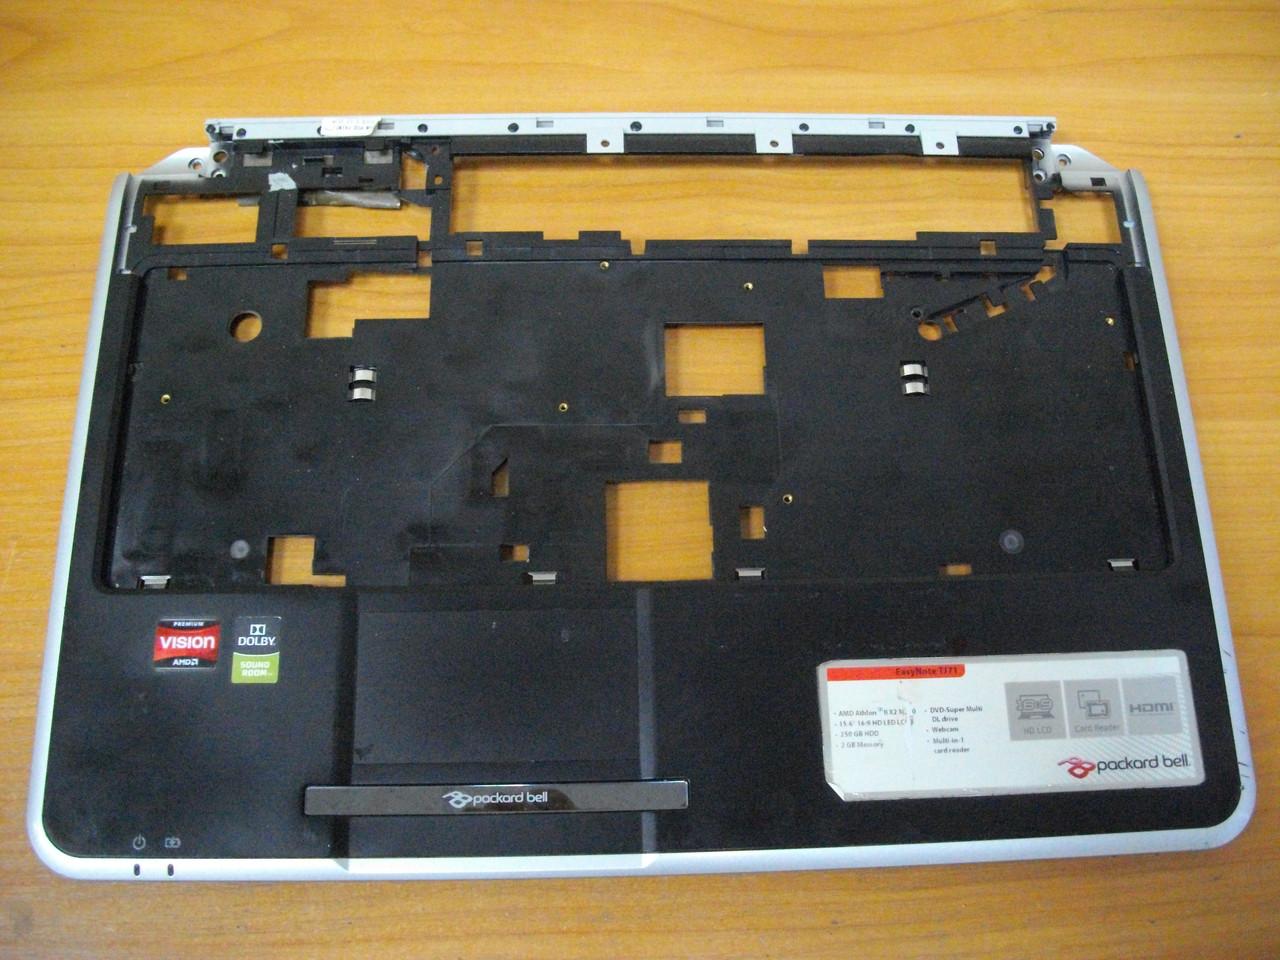 Корпус Верхняя часть корпуса с тачпадом Packard bell MS2285 TJ71